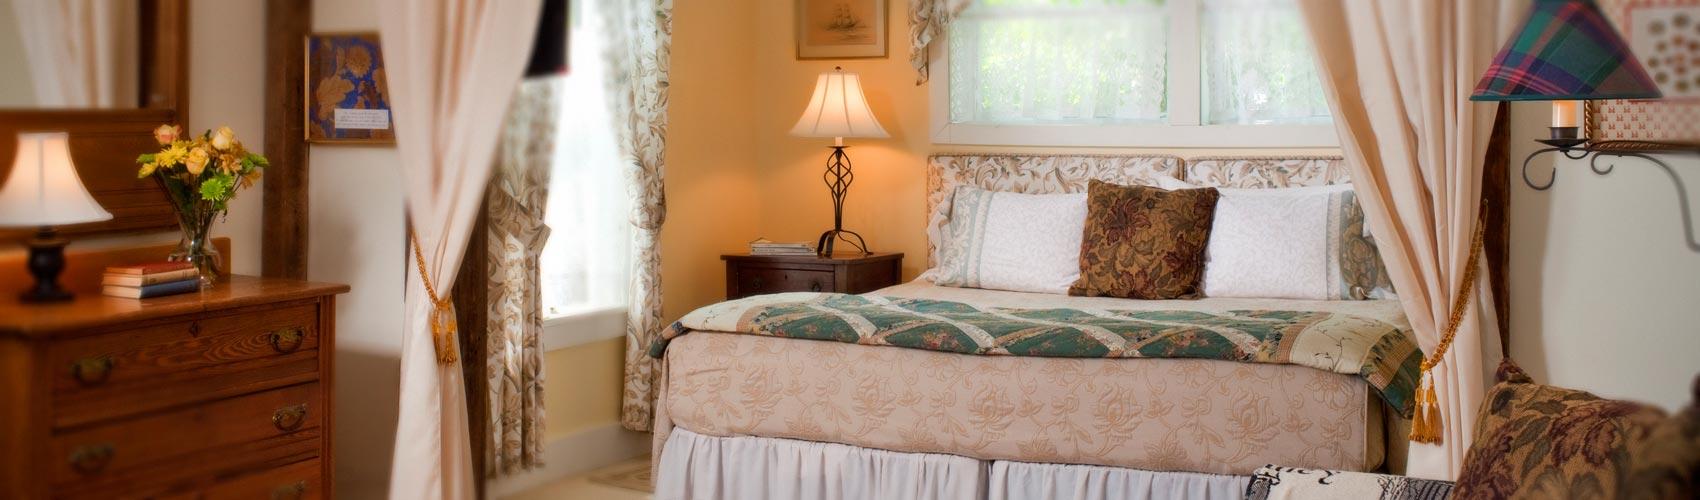 Allen Suite at West Hill House B&B